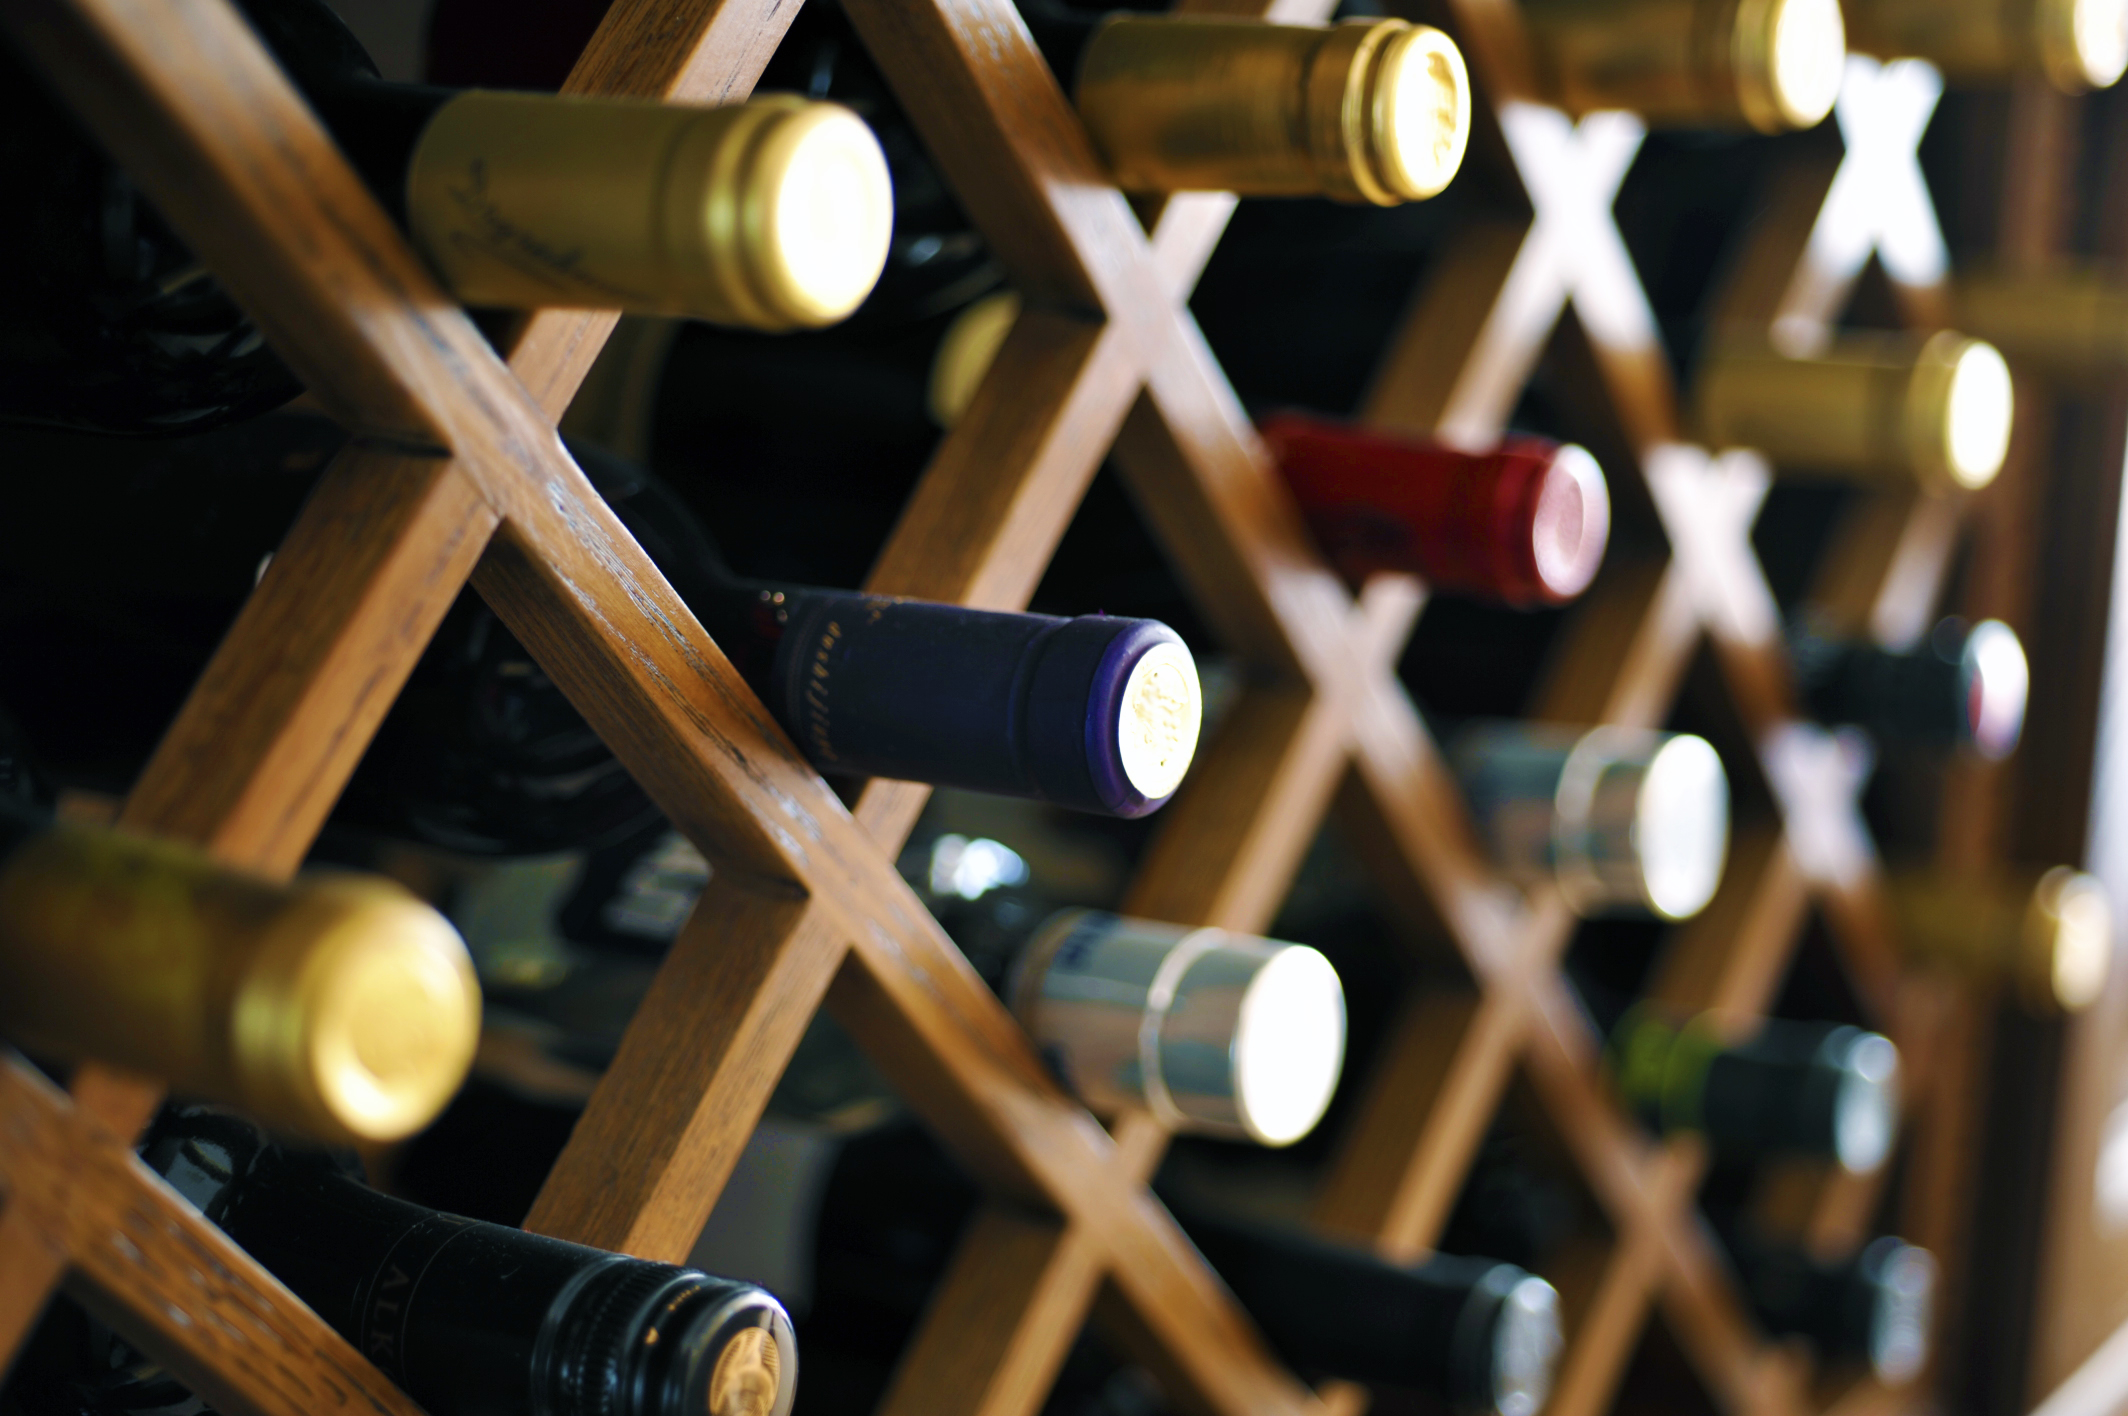 Wine bottles in a vertical rack